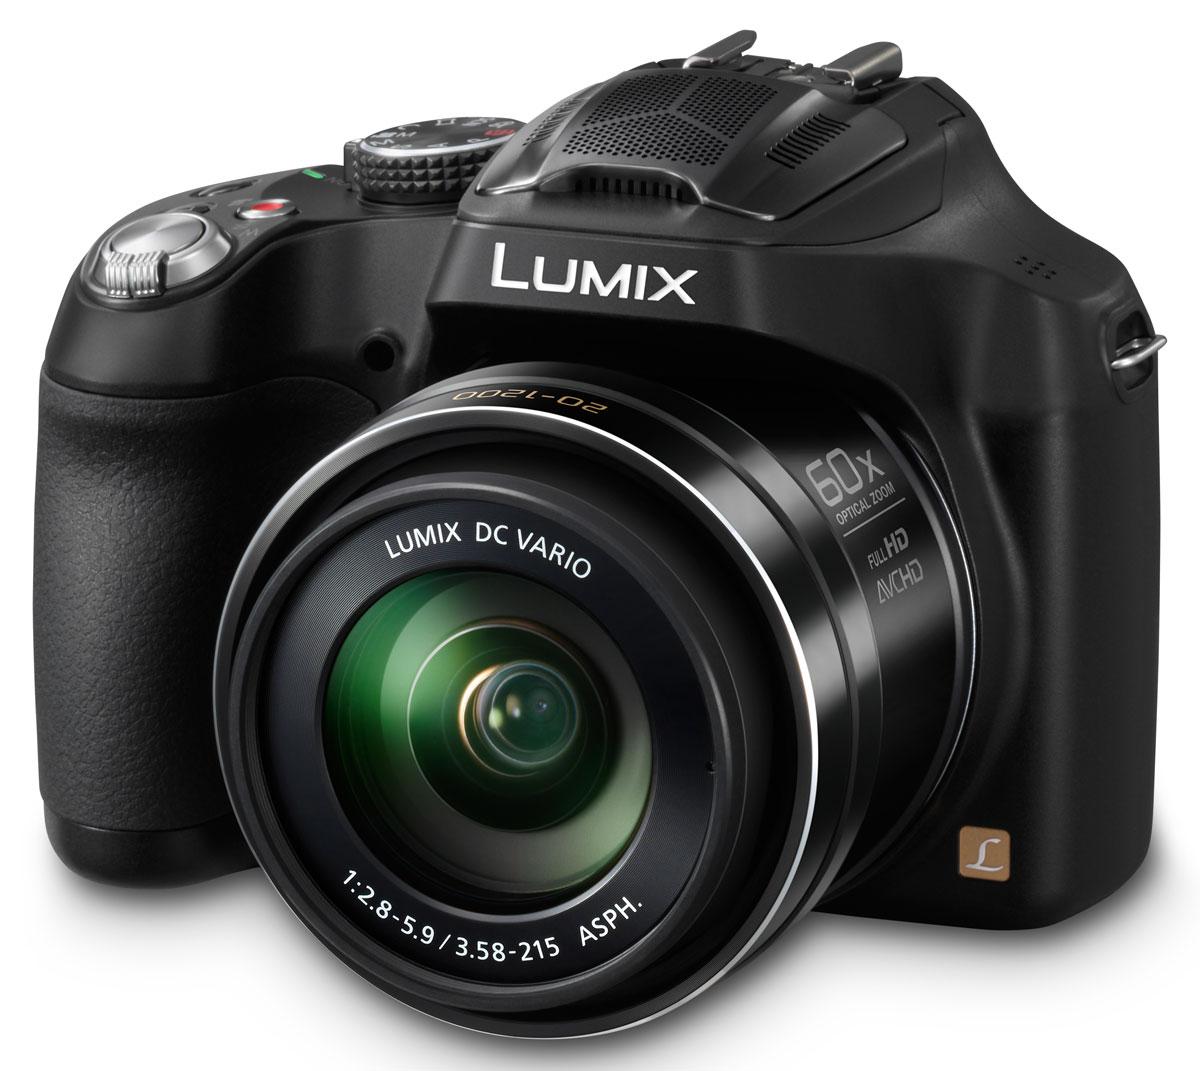 Panasonic Lumix DMC-FZ72 Black цифровая фотокамера